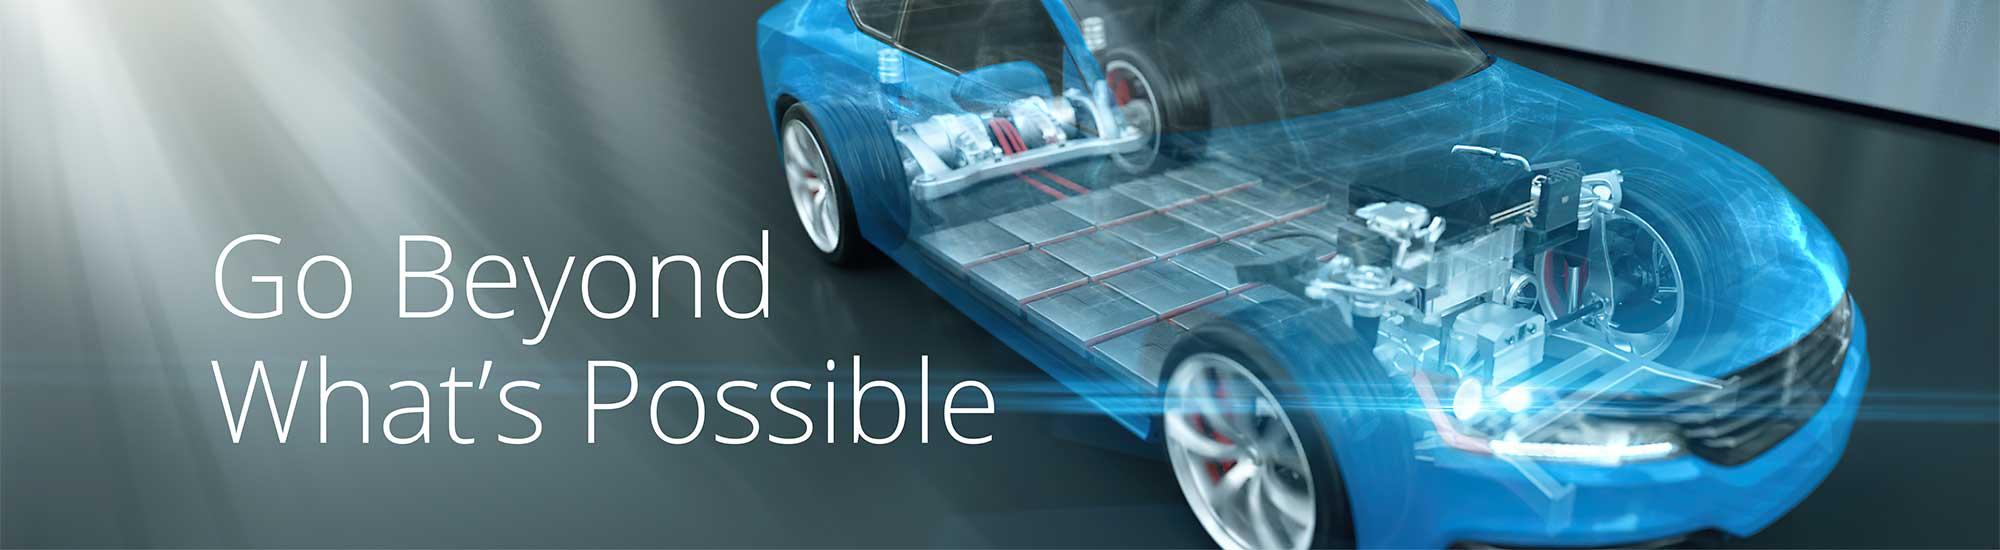 E-Mobility Banner